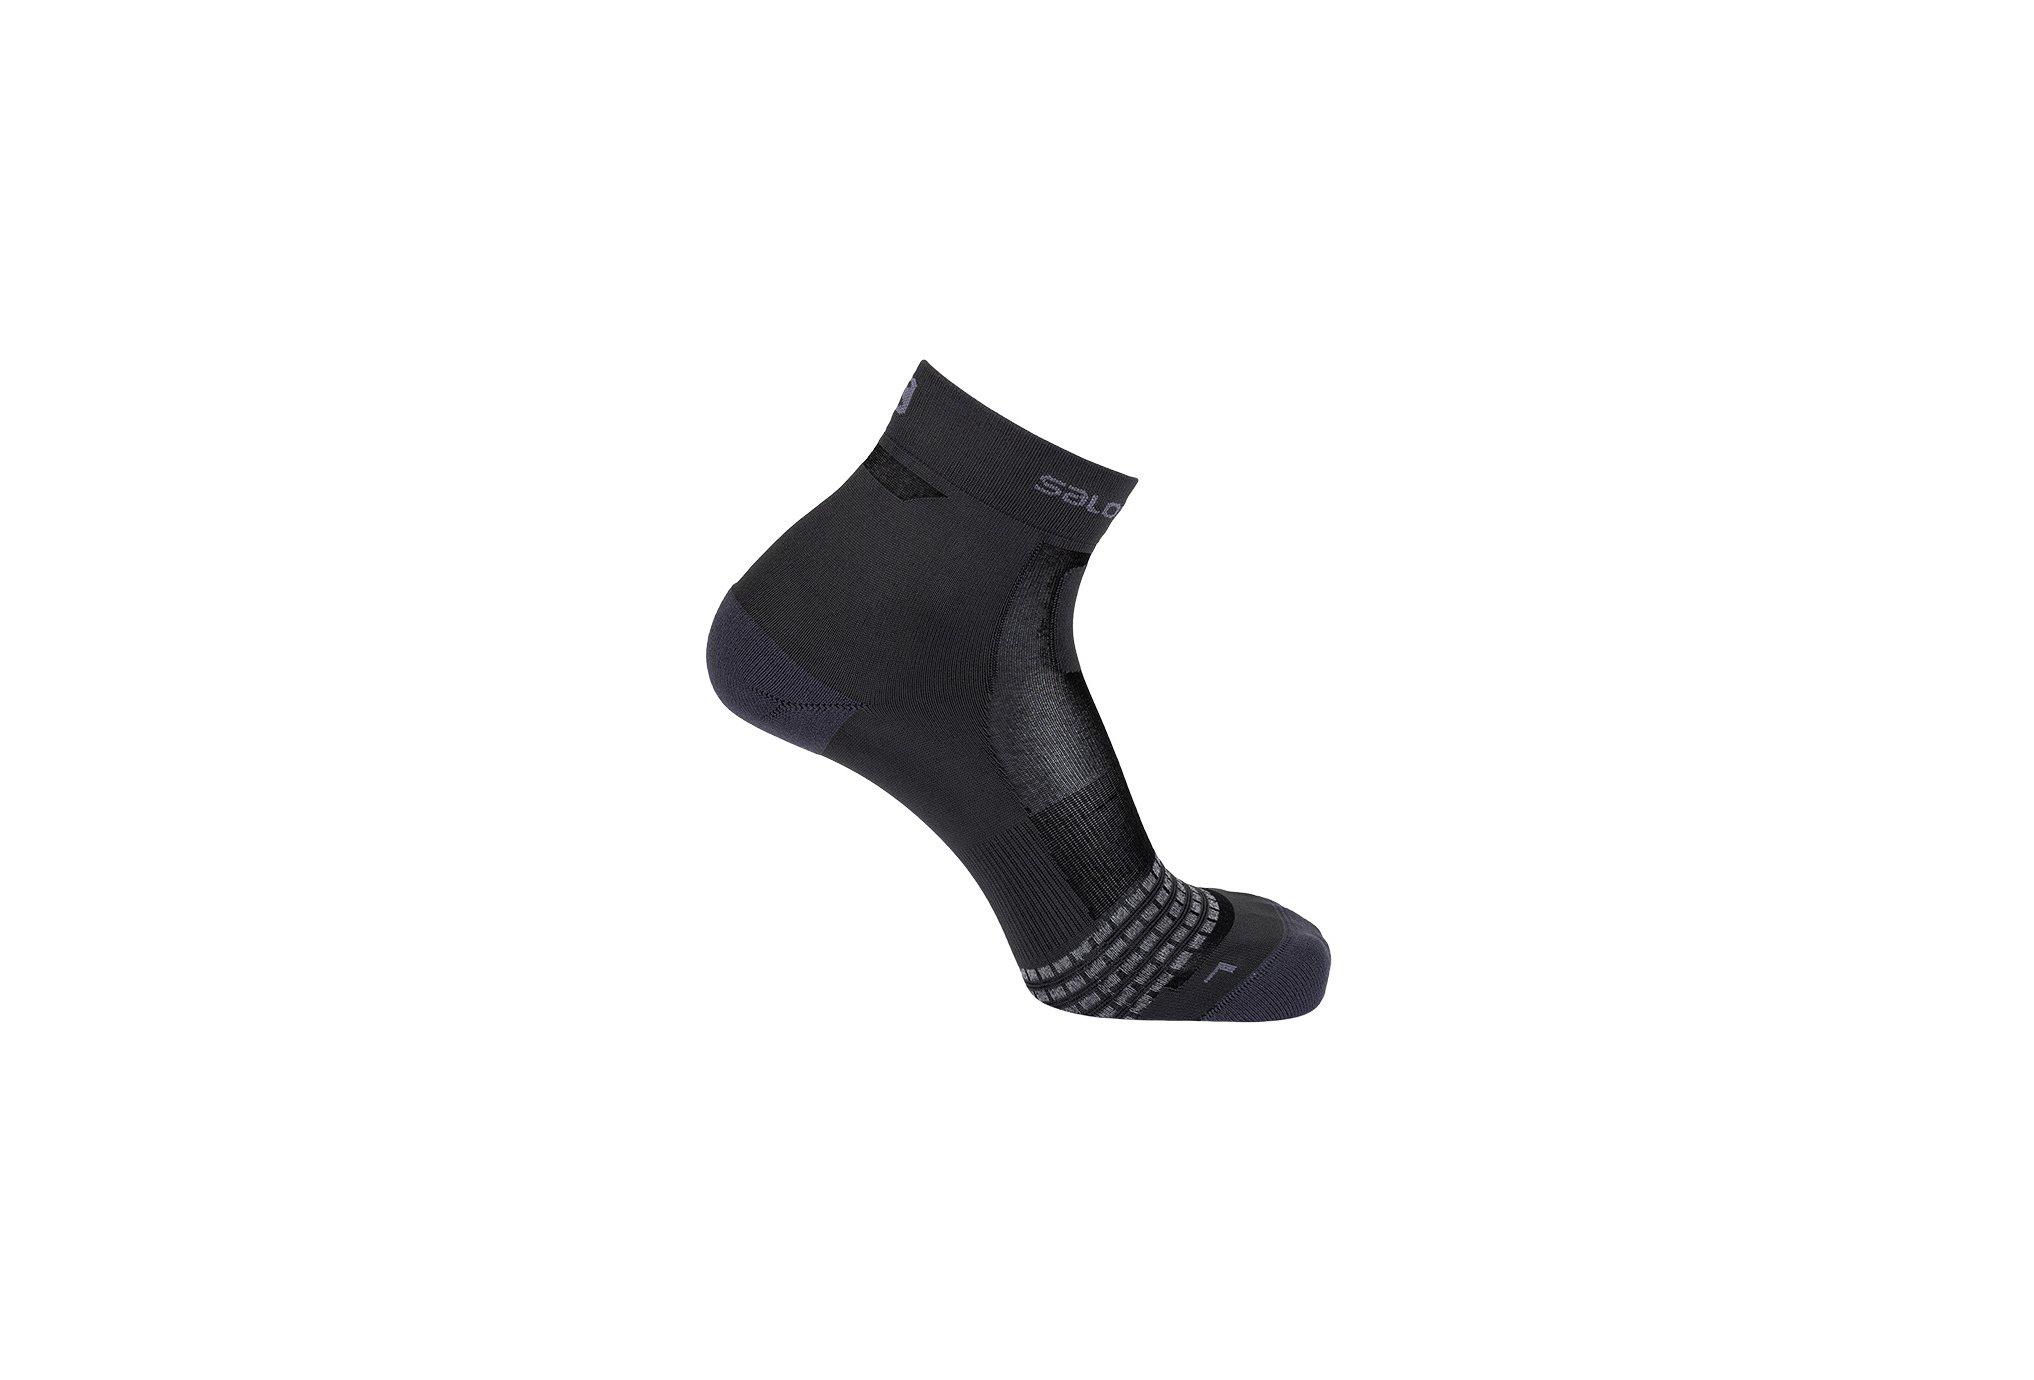 Salomon NSO Short Run Chaussettes